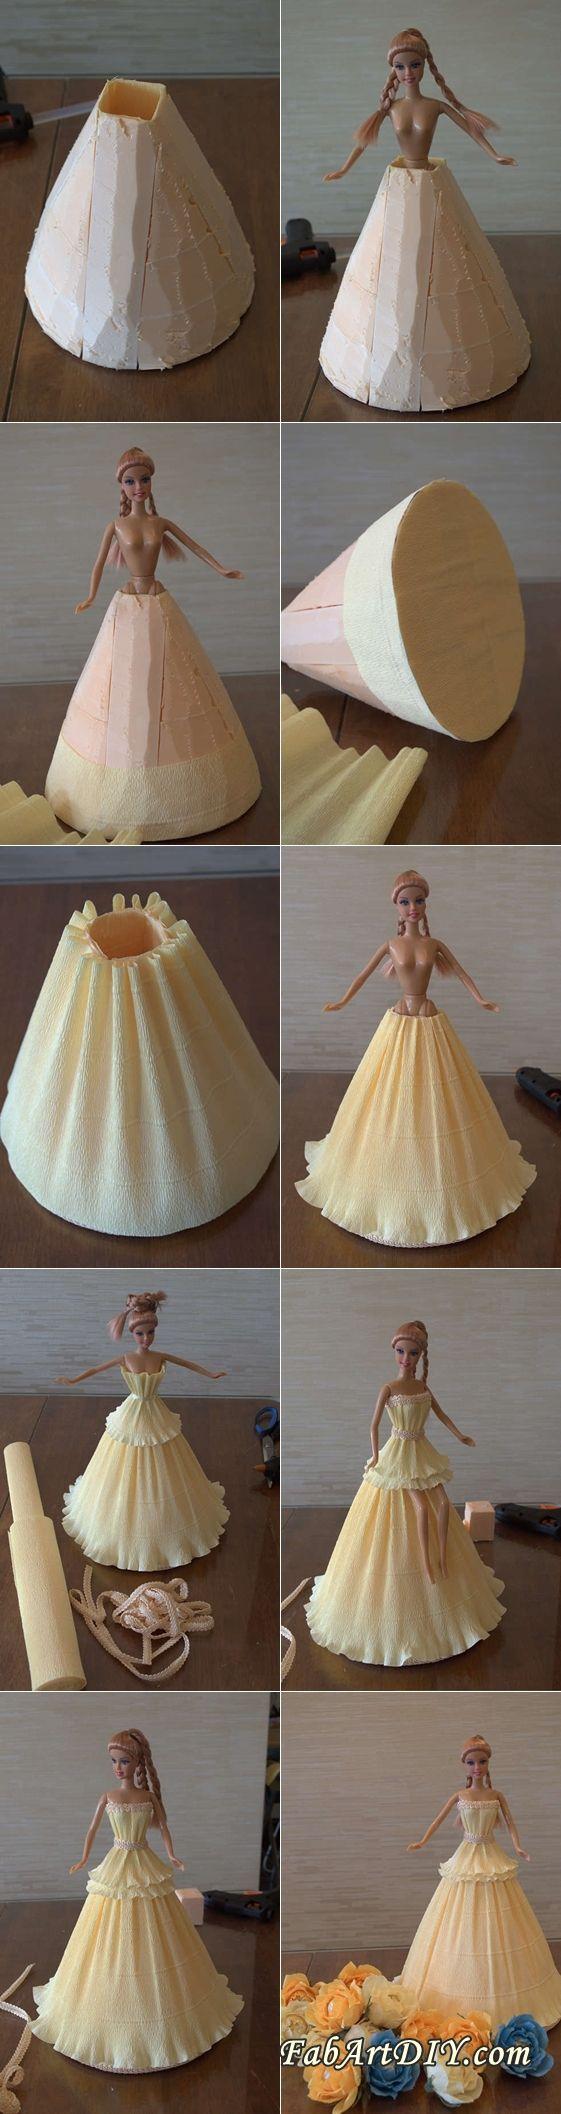 DIY Crepe Paper Barbie Dress | www.FabArtDIY.com LIKE Us on Facebook ==> https://www.facebook.com/FabArtDIY